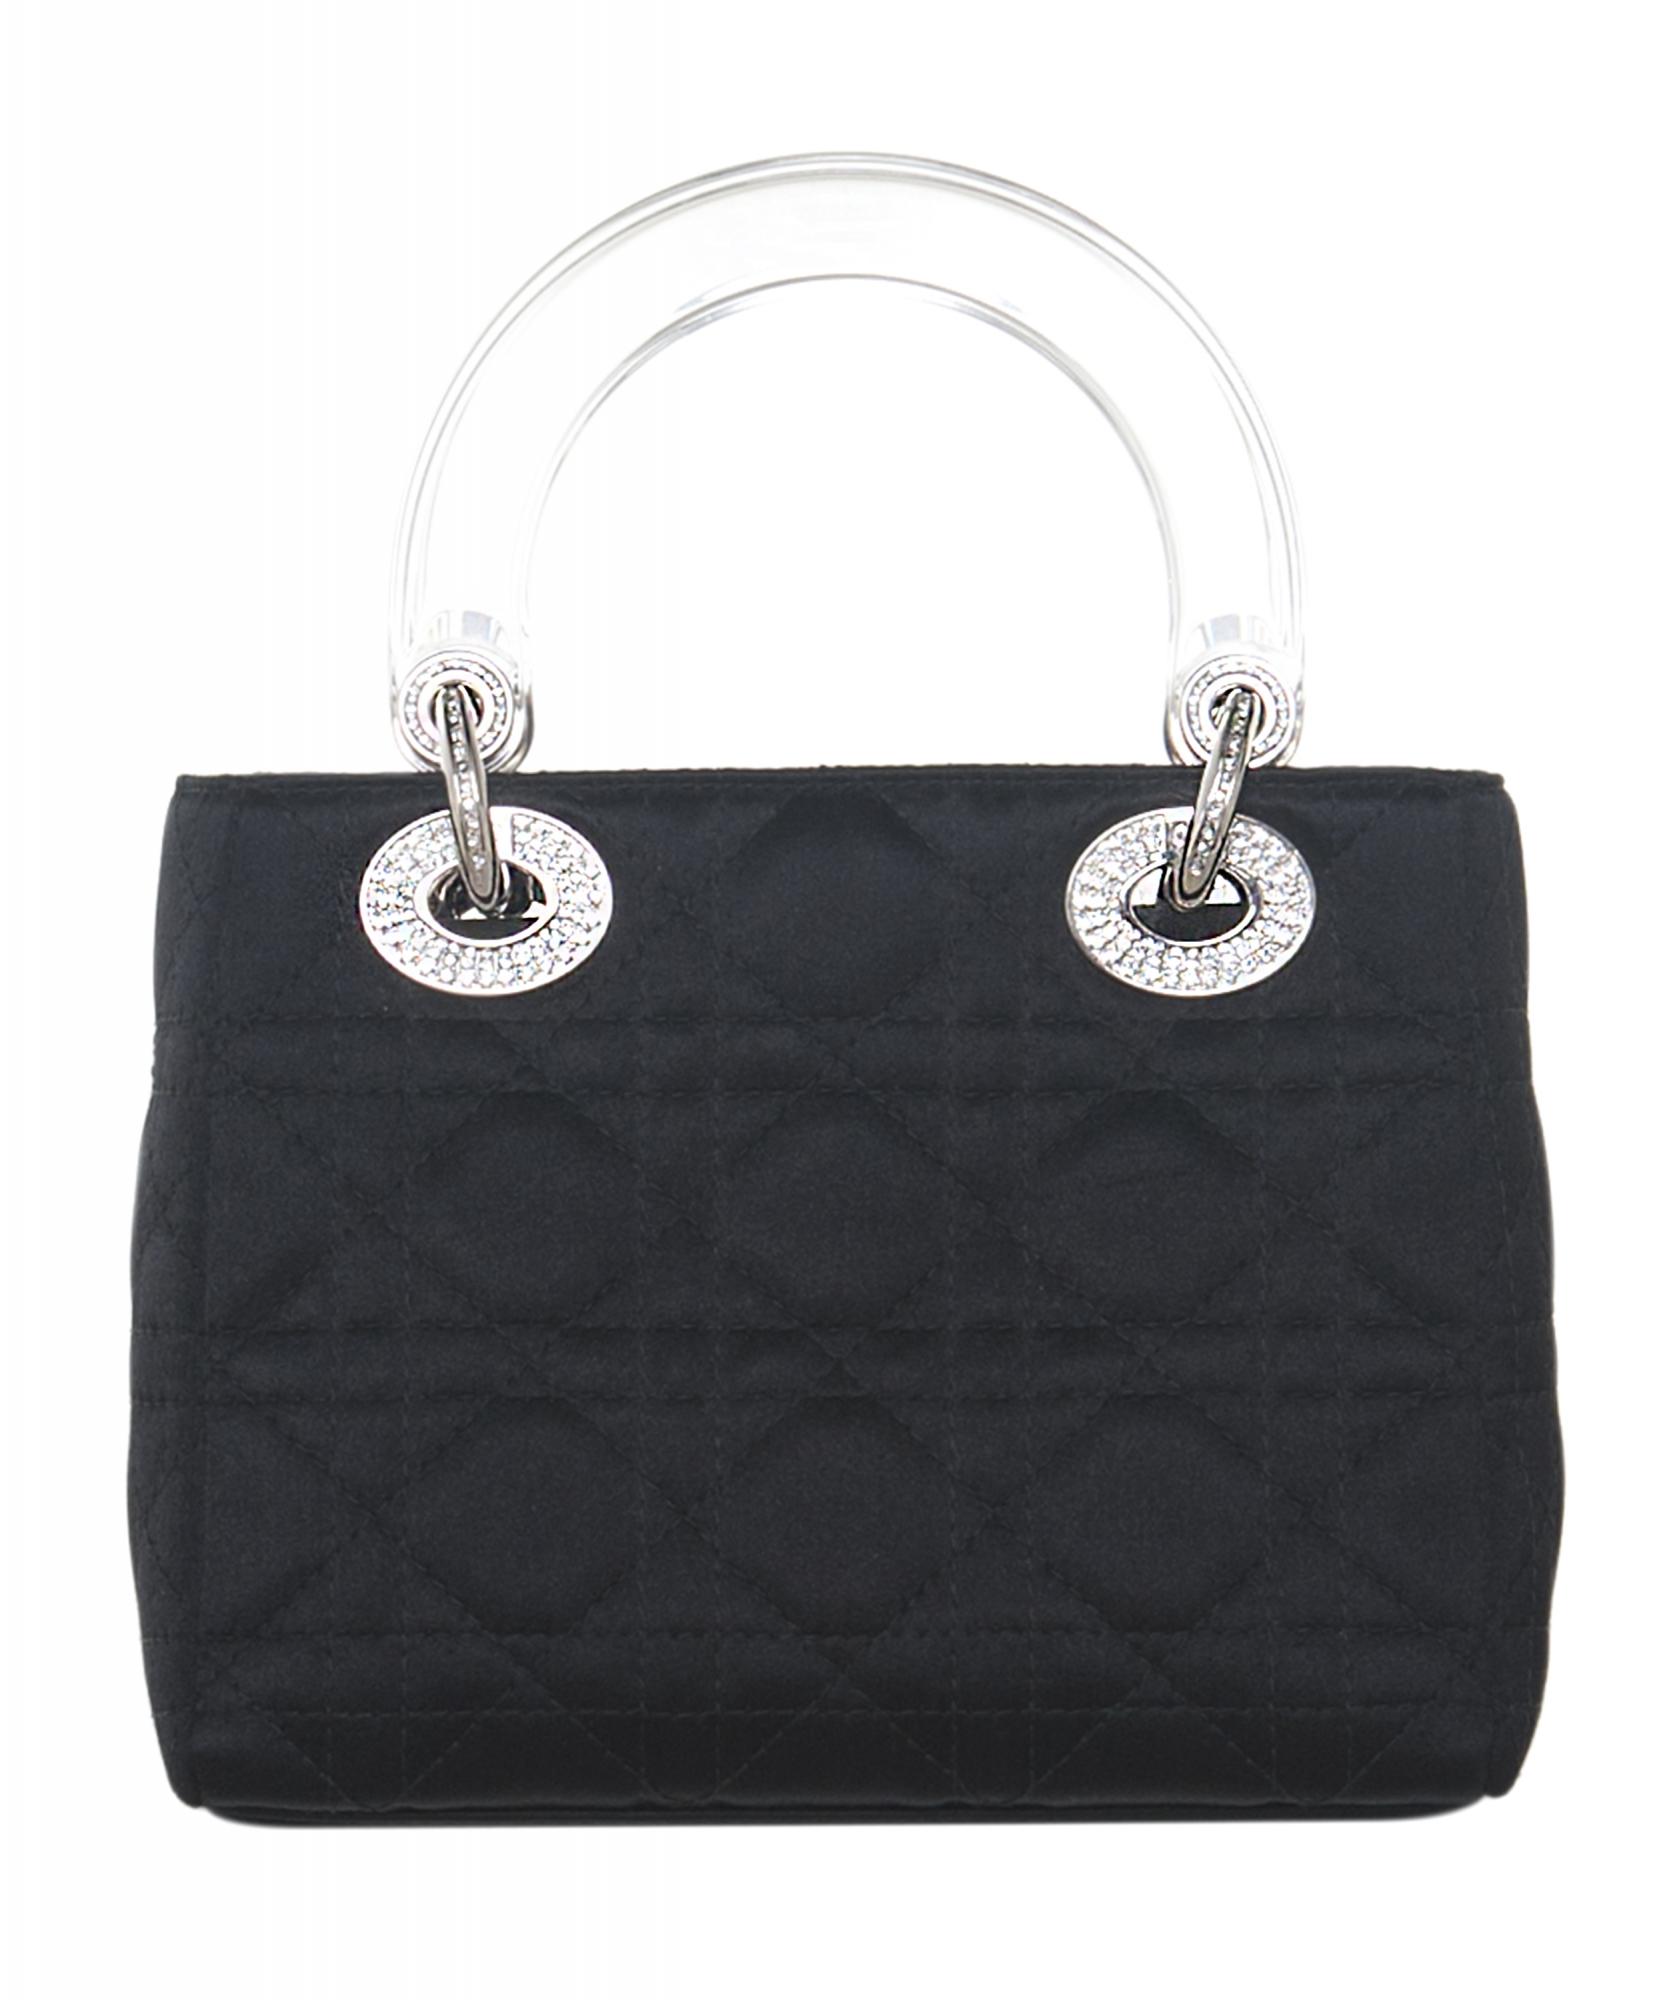 Christian Dior Mini Satin  Lady Dior  Bag  9b9c7586f1119